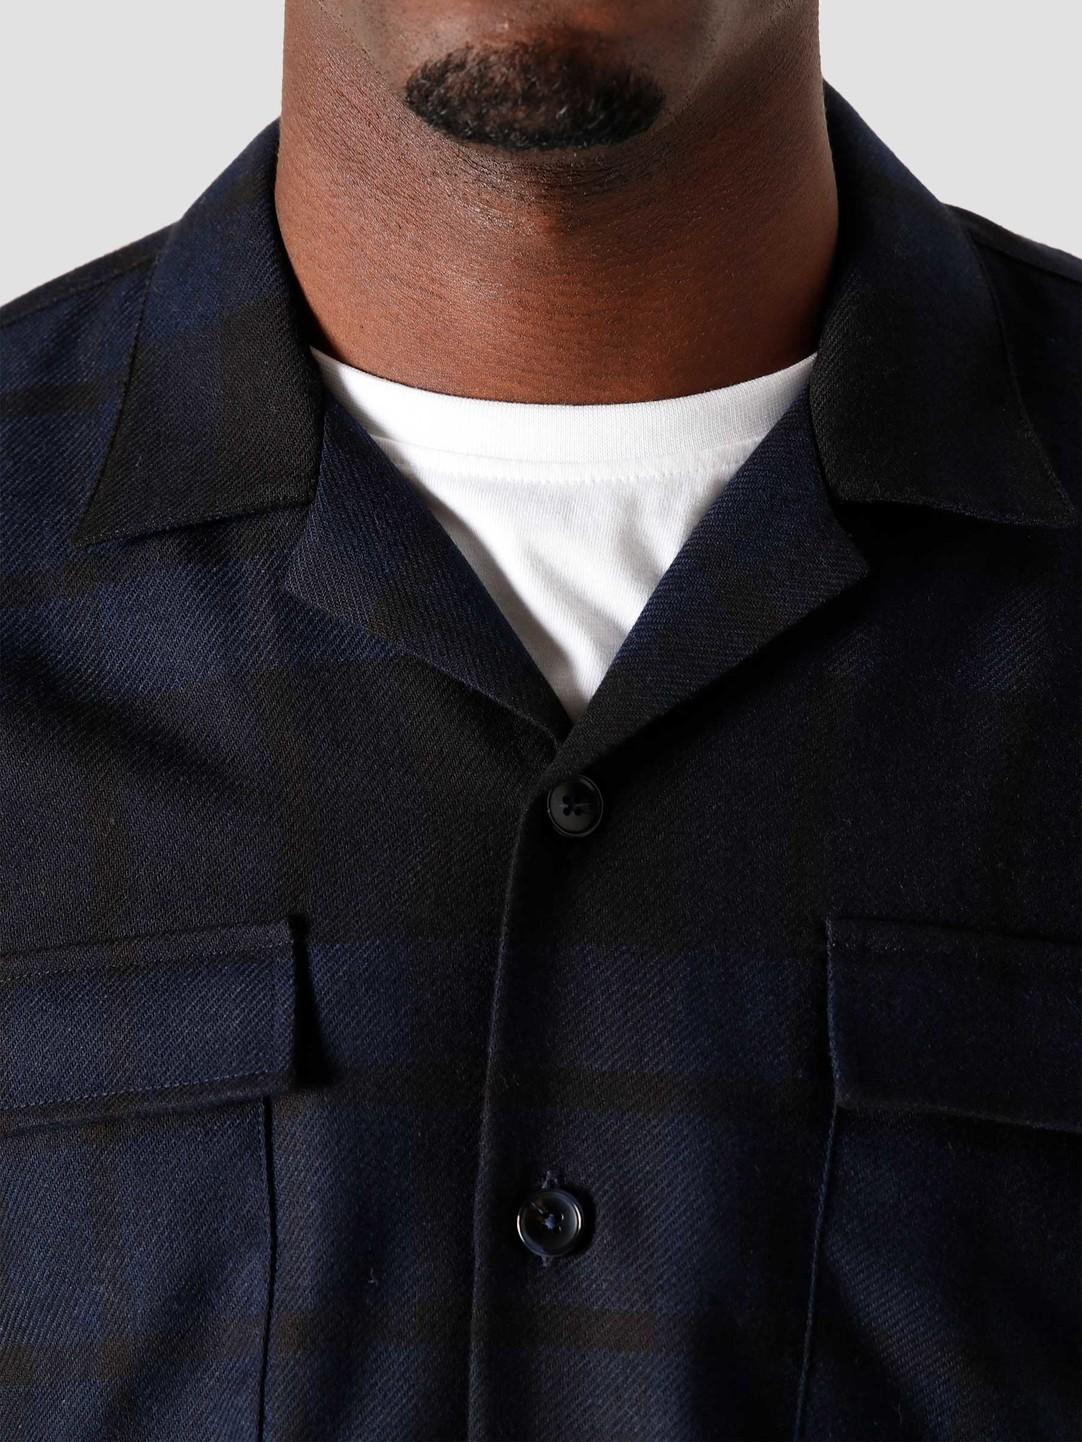 Libertine Libertine Libertine Libertine Cave Pocket Shirt Dark Navy Check 1964